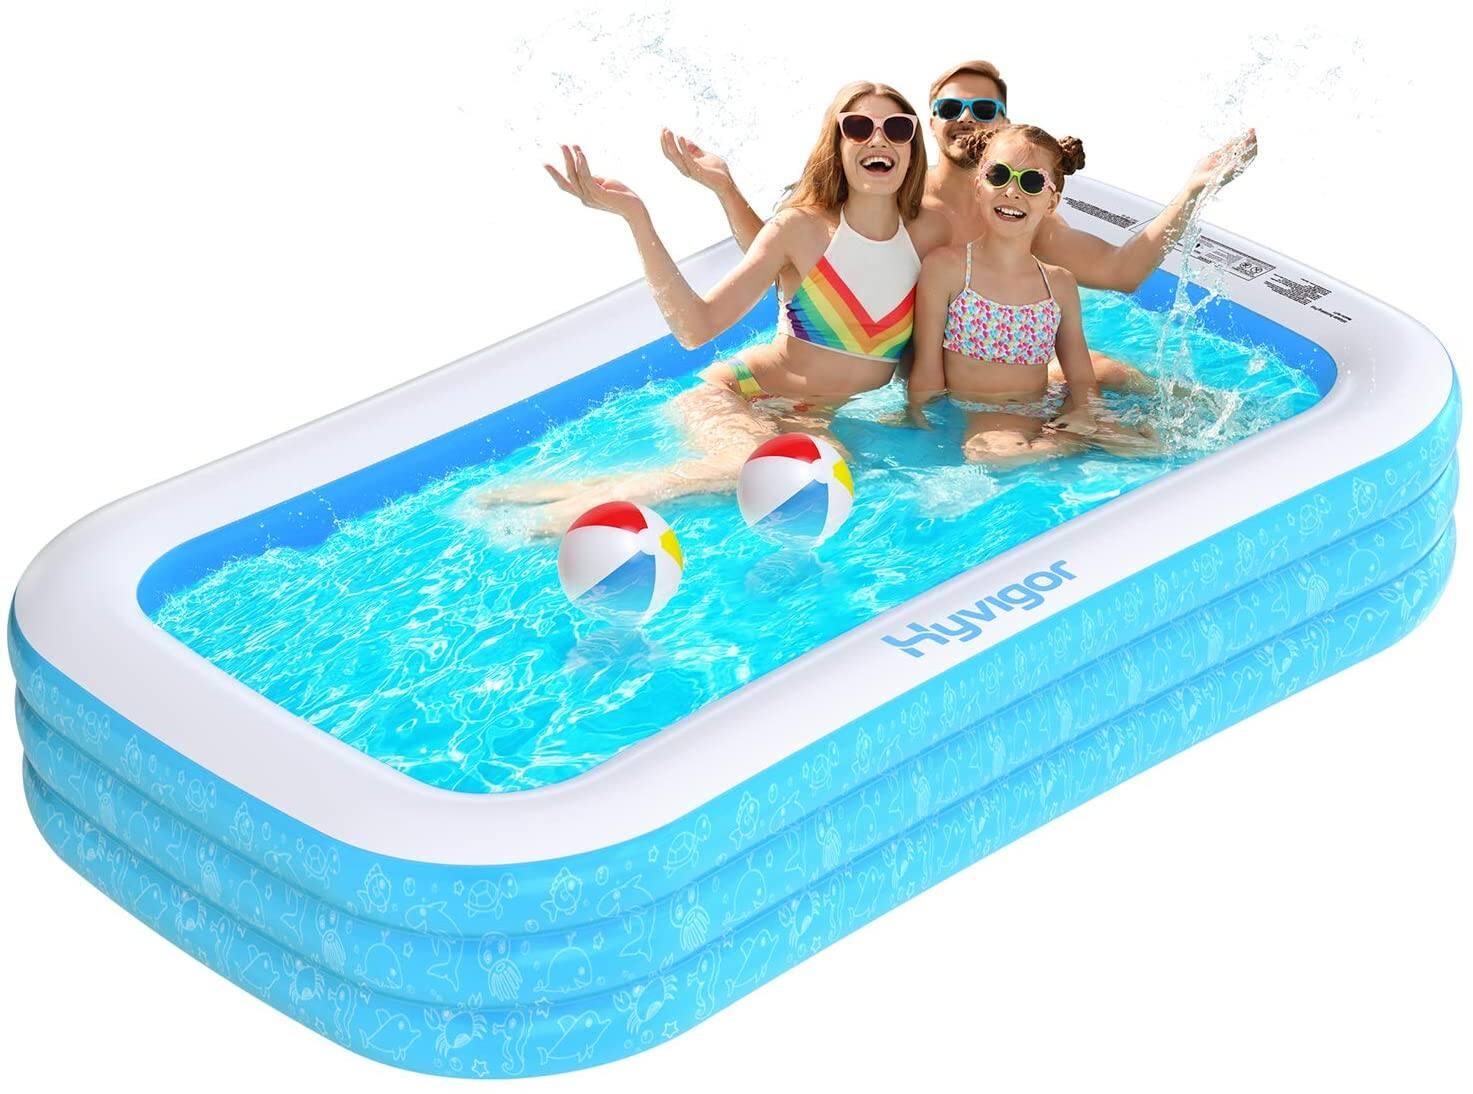 Globmall US via Amazon: Hyvigor Inflatable Swimming Pool $45.49 + Free Shipping